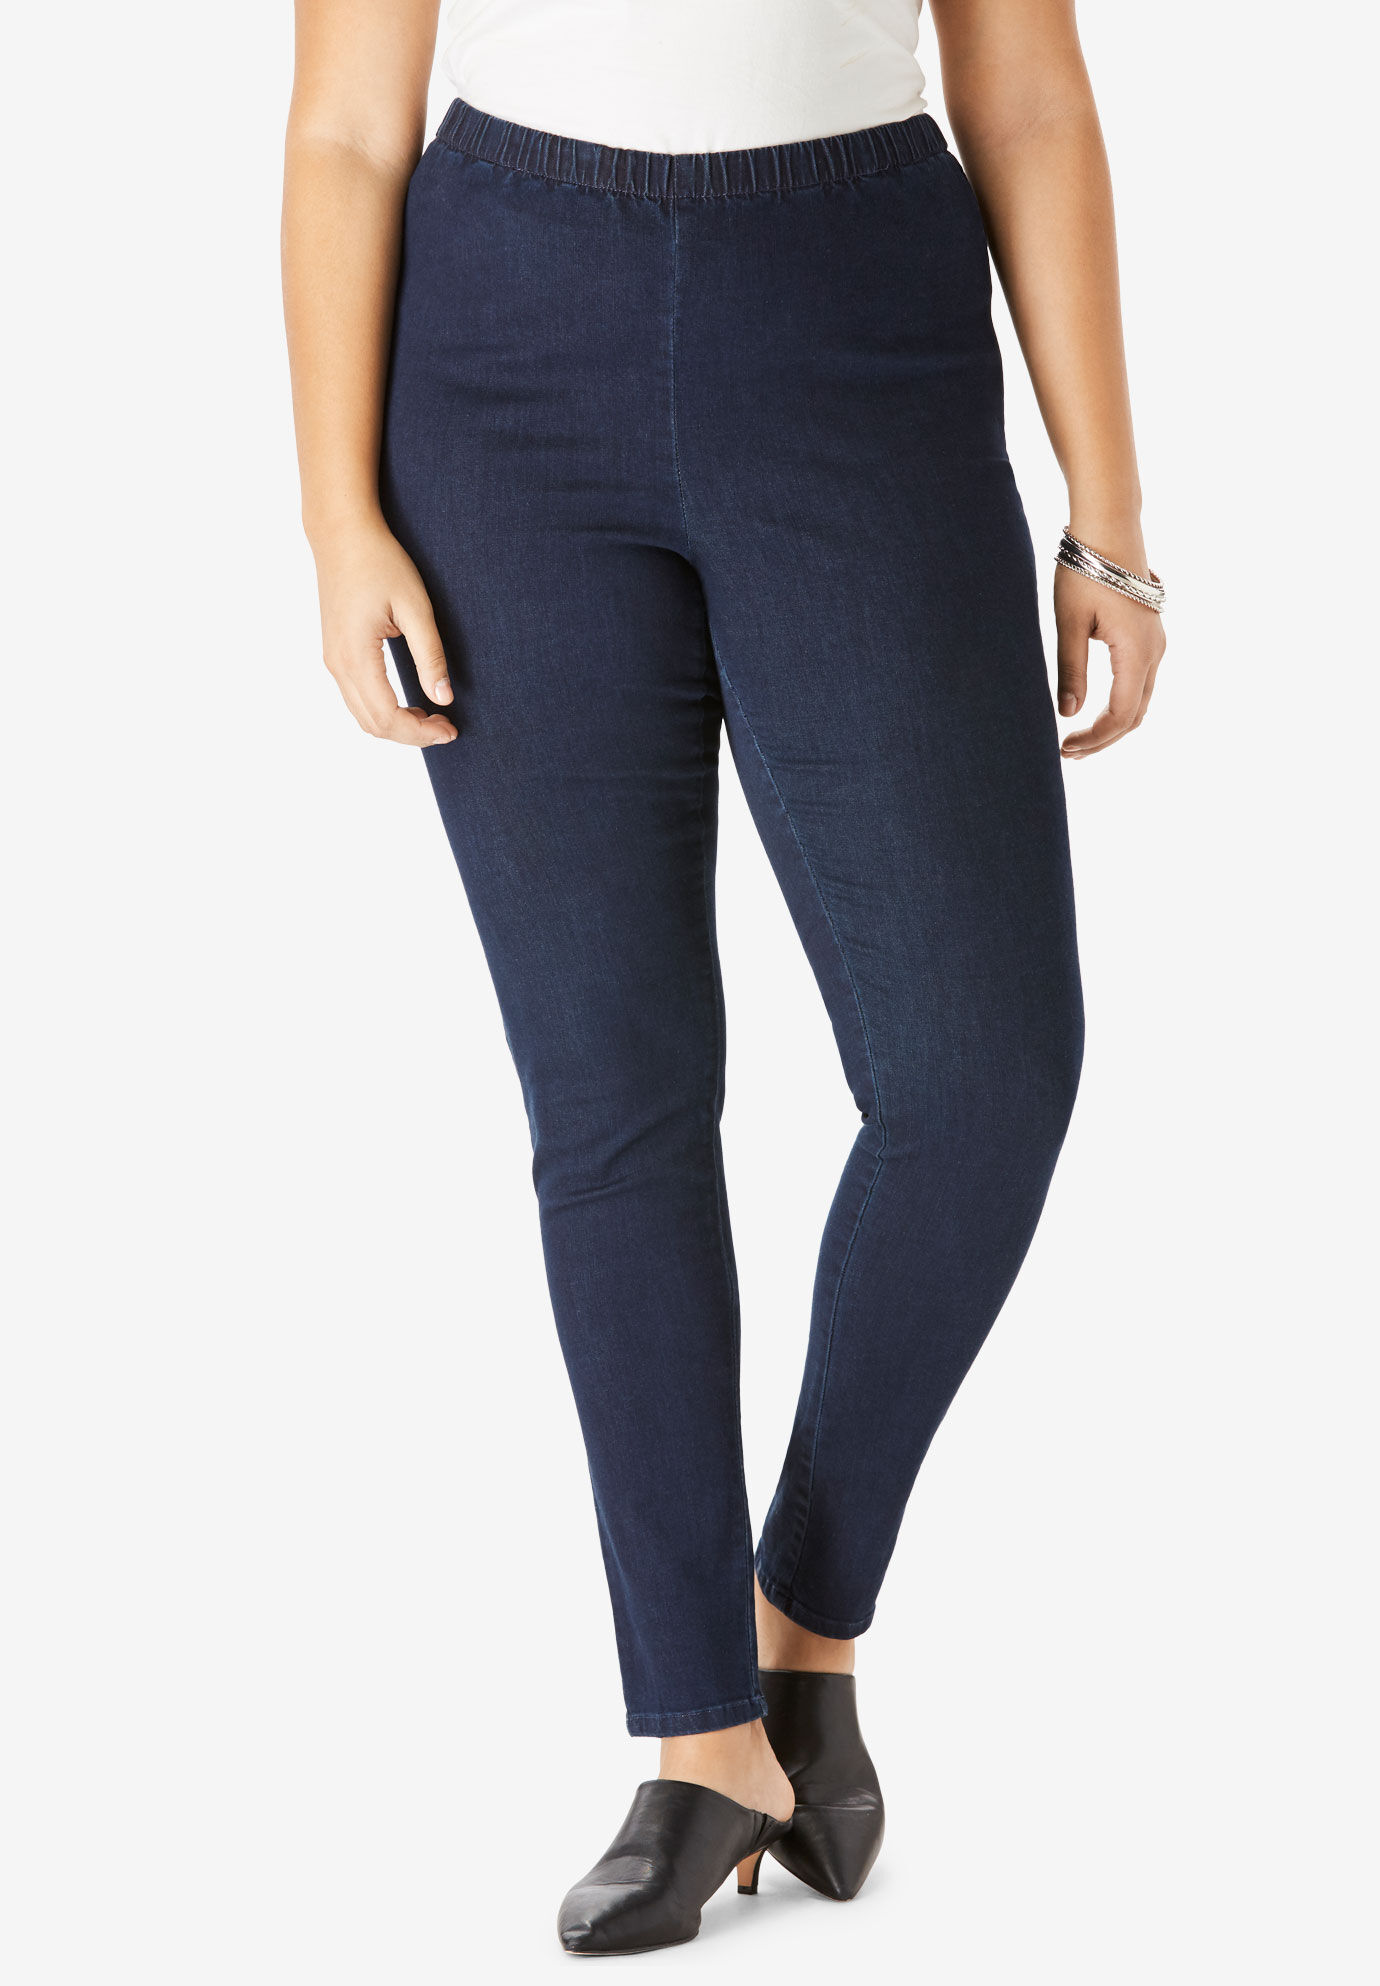 New Womens Ponte Denim Jeans Leggings Ladies Plus Size Trousers Jeggings 14-28